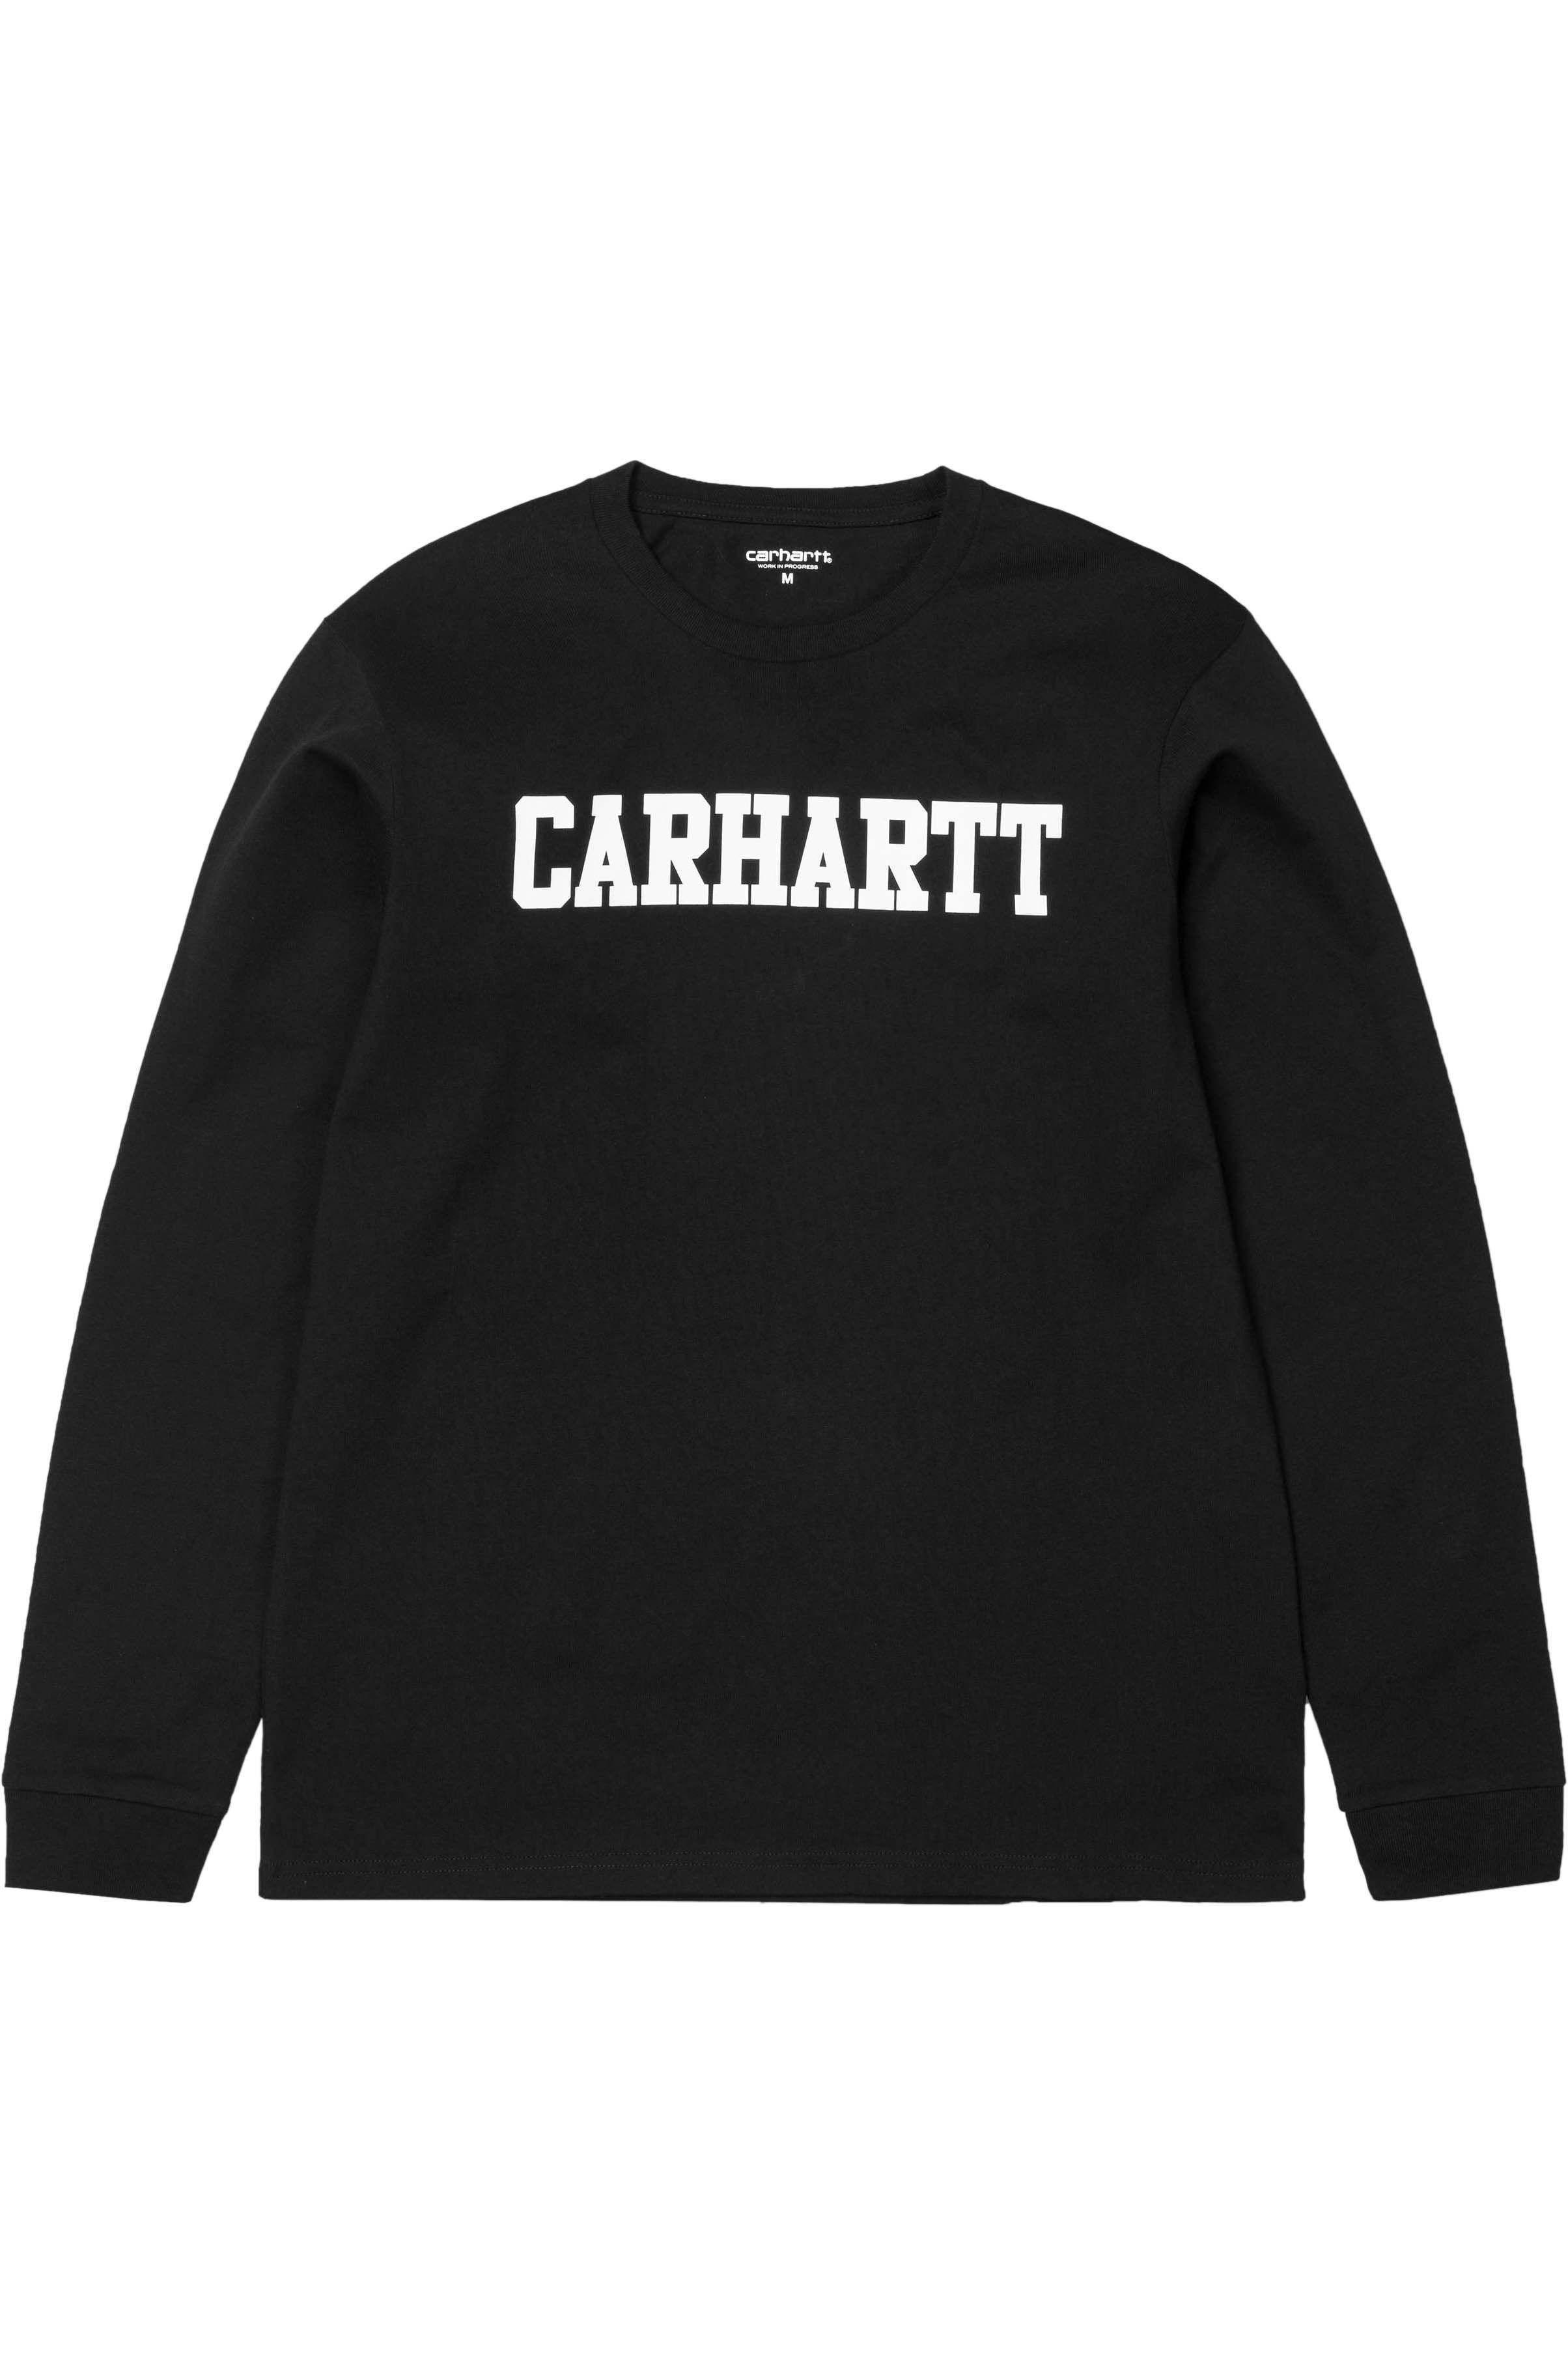 L-Sleeve Carhartt WIP COLLEGE Black/White